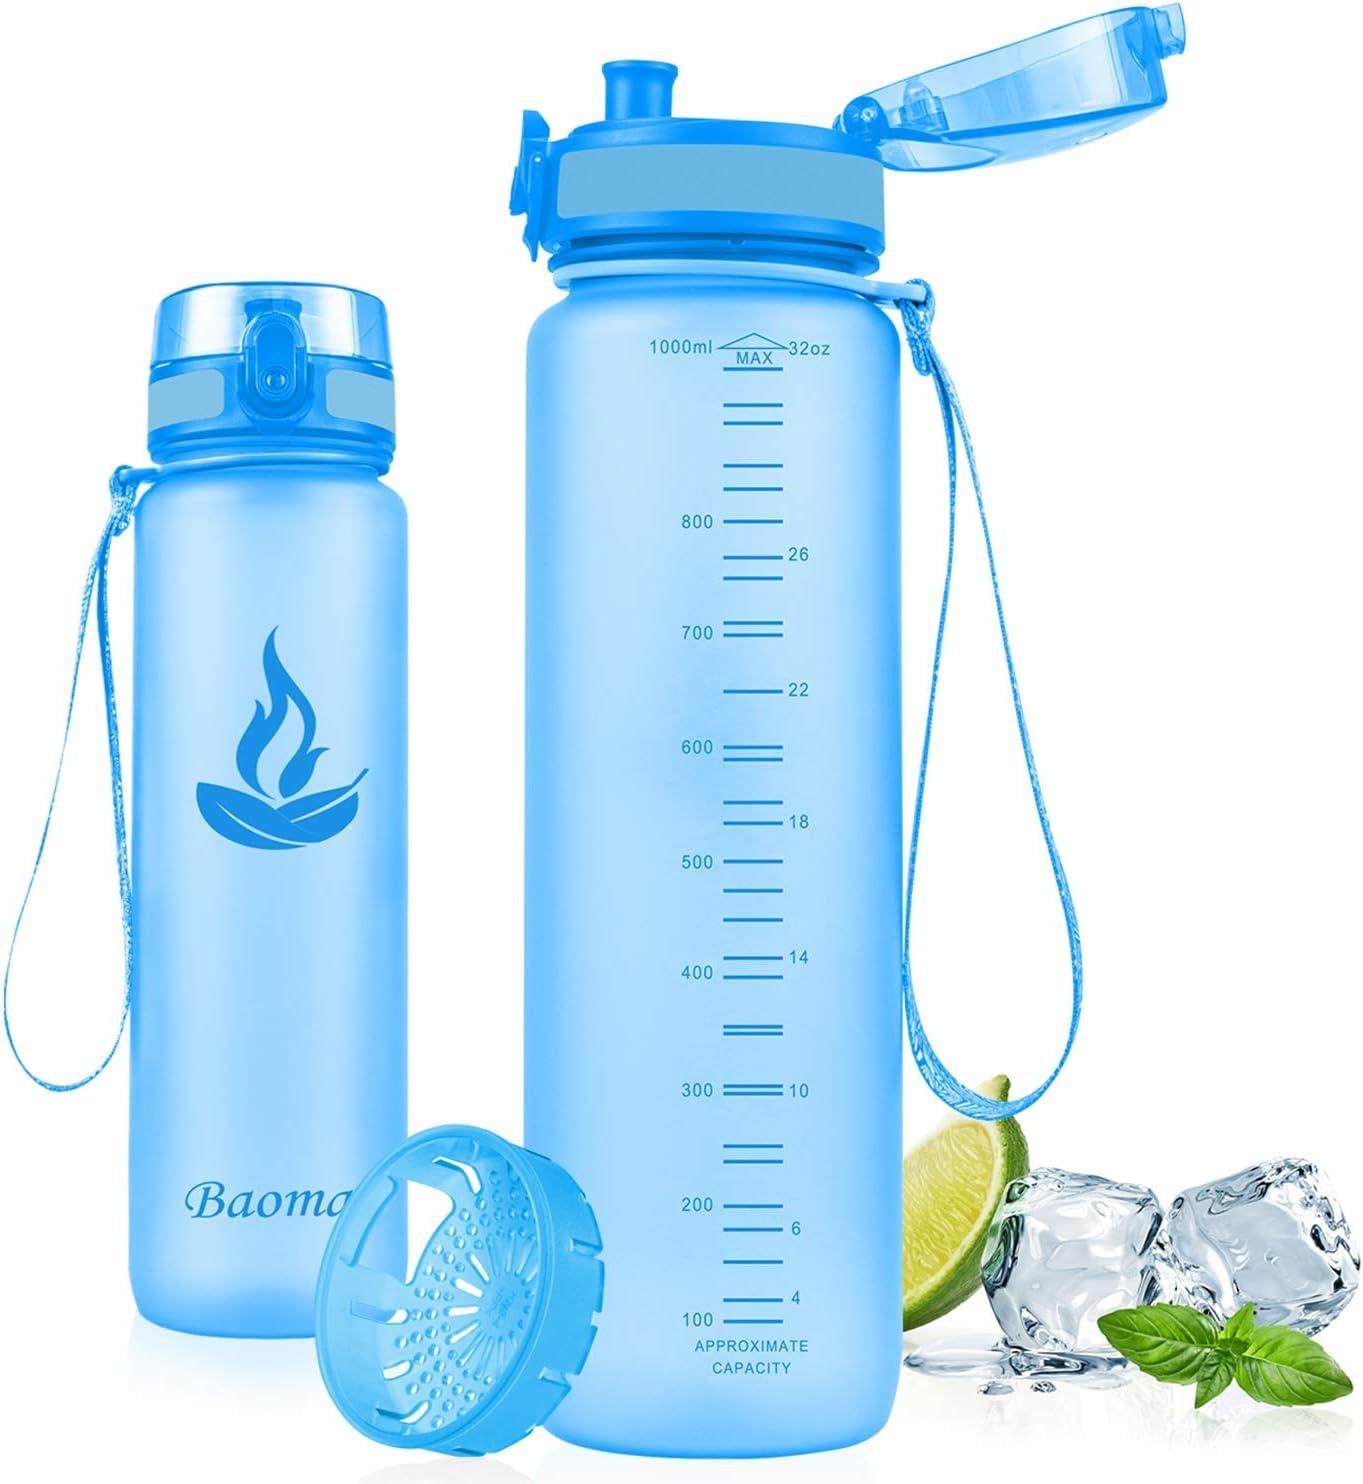 Baomay Botella de Agua Deportiva 500ml 750ml 1000ml, Adultos/Niños Bottle con Filtro, Bidon de Bebidas Plástico Tritan, para Gimnasio, Ciclismo, Trekking   Sin-BPA & Impermeable & Reutilizable